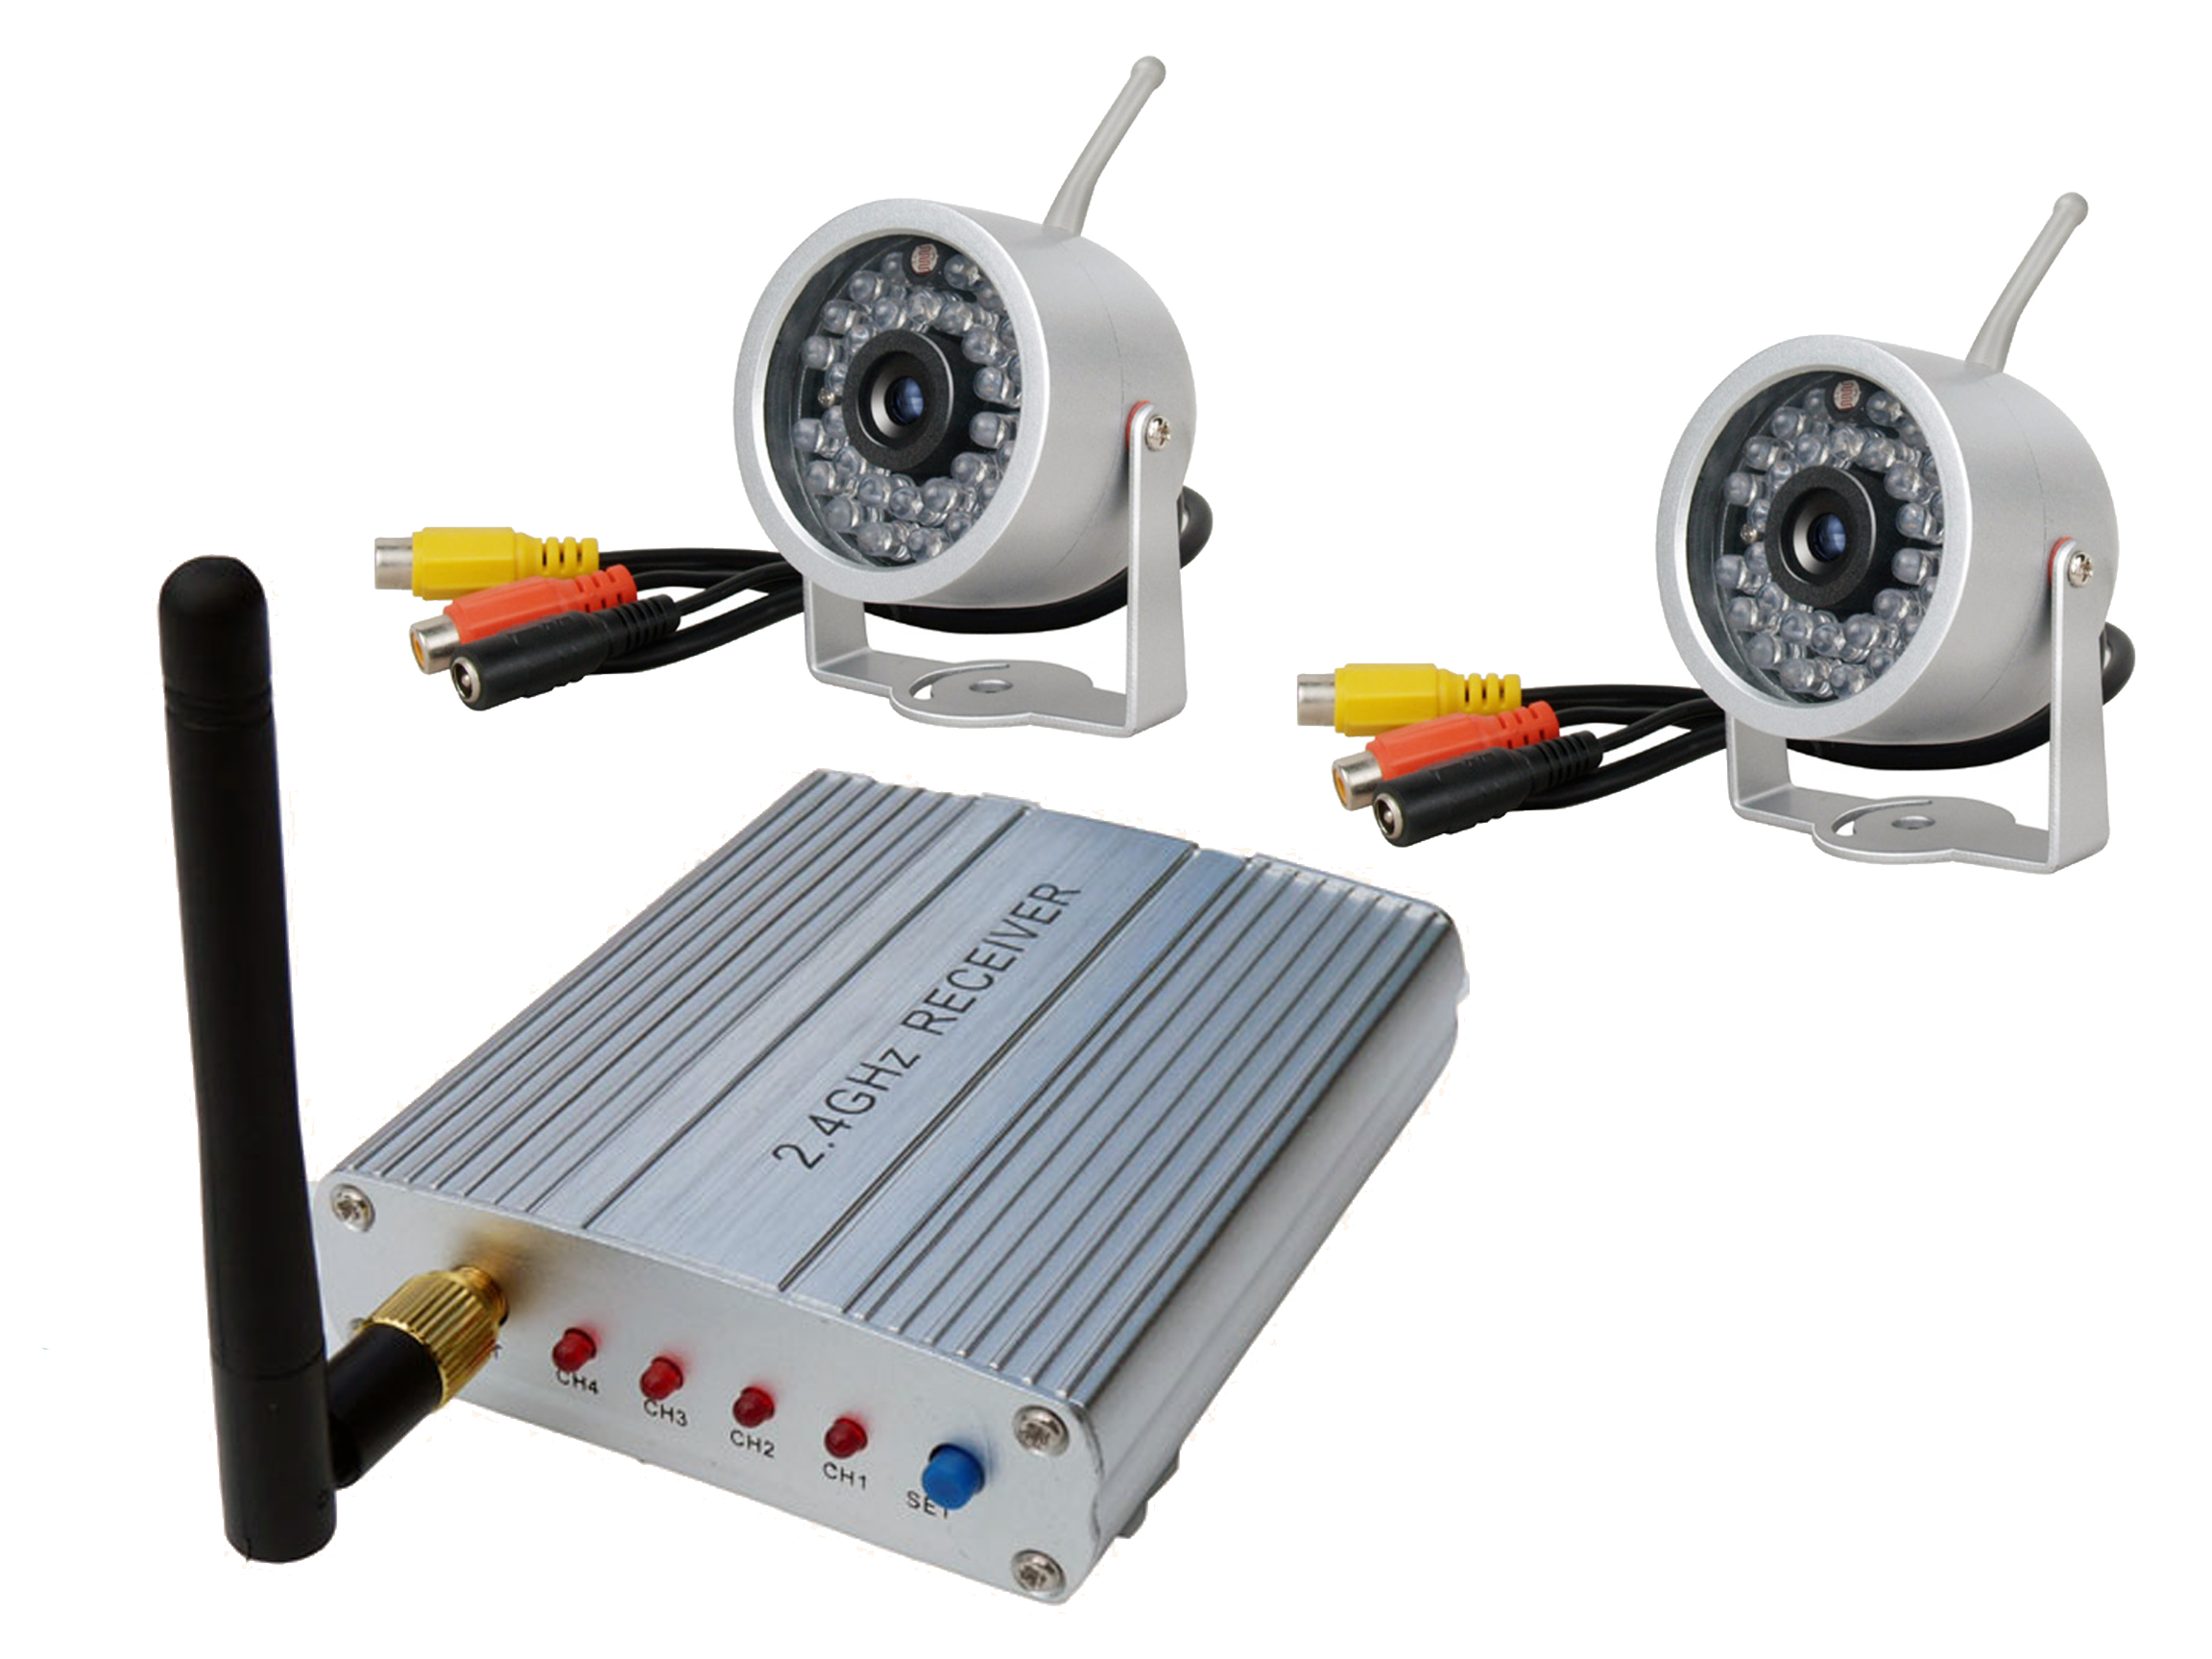 2 4ghz mini funk berwachungskamera video berwachung set mit 2 kameras ebay. Black Bedroom Furniture Sets. Home Design Ideas